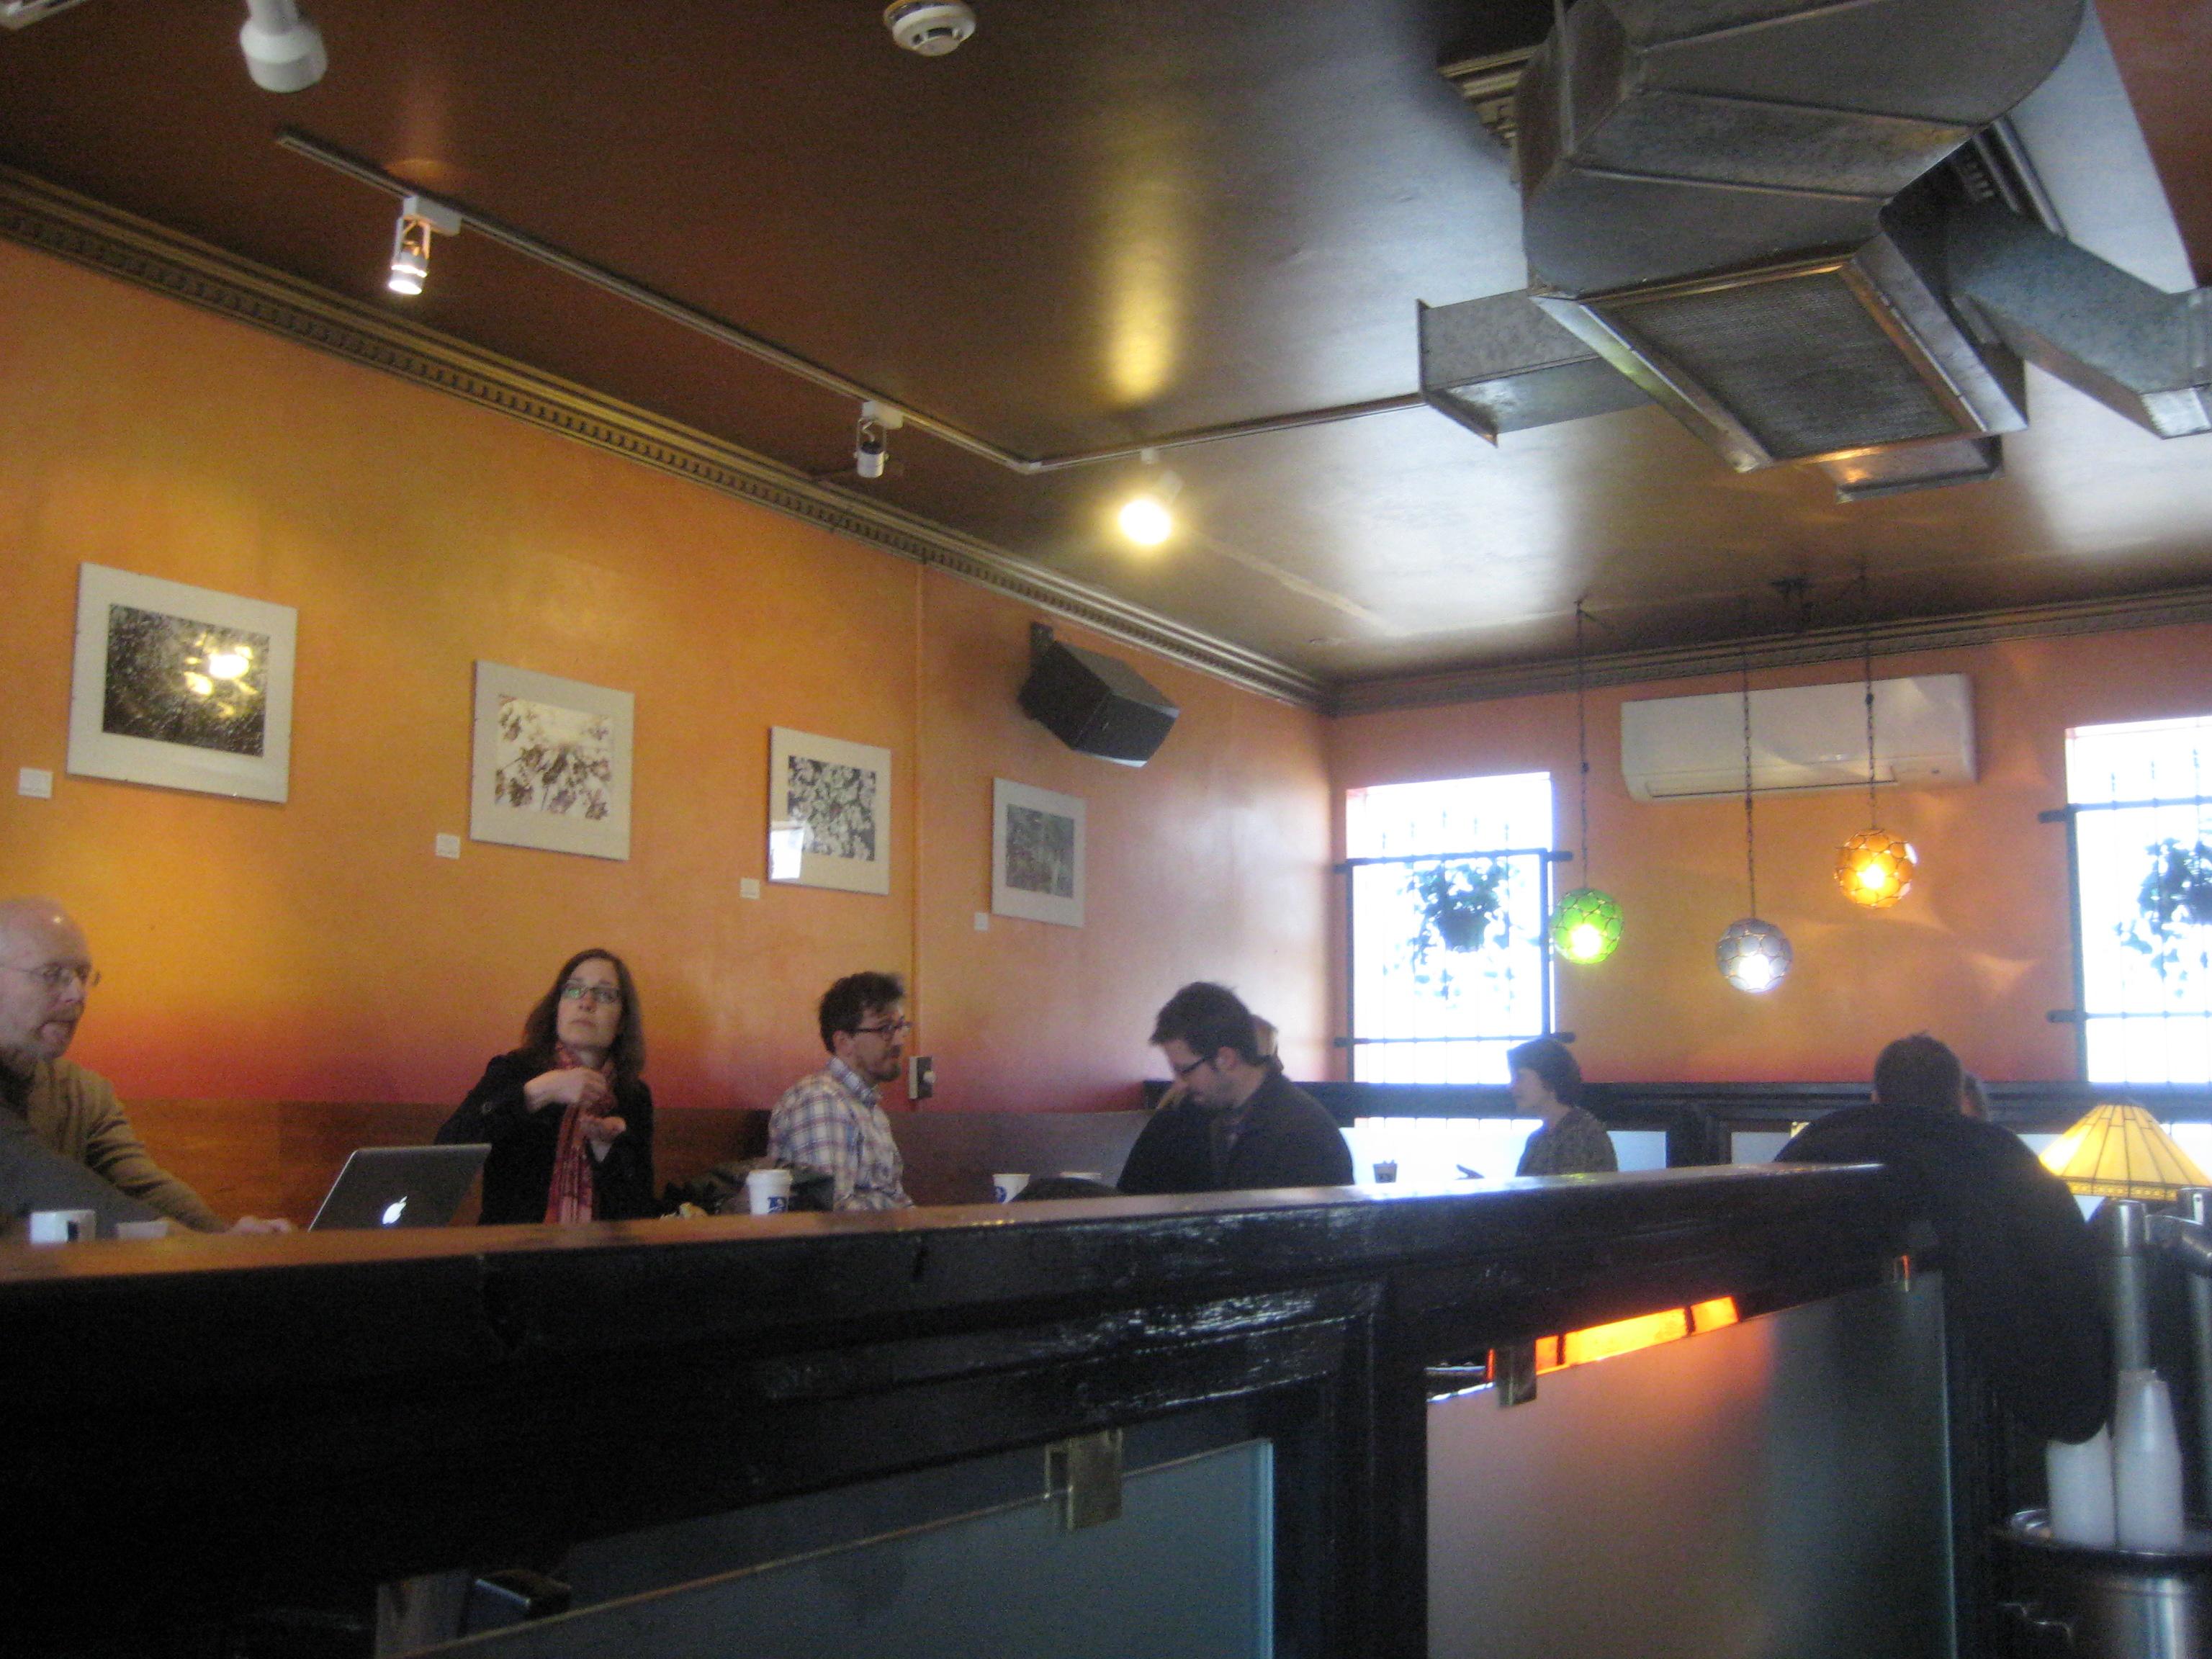 darwins cafe interior cambridge ma